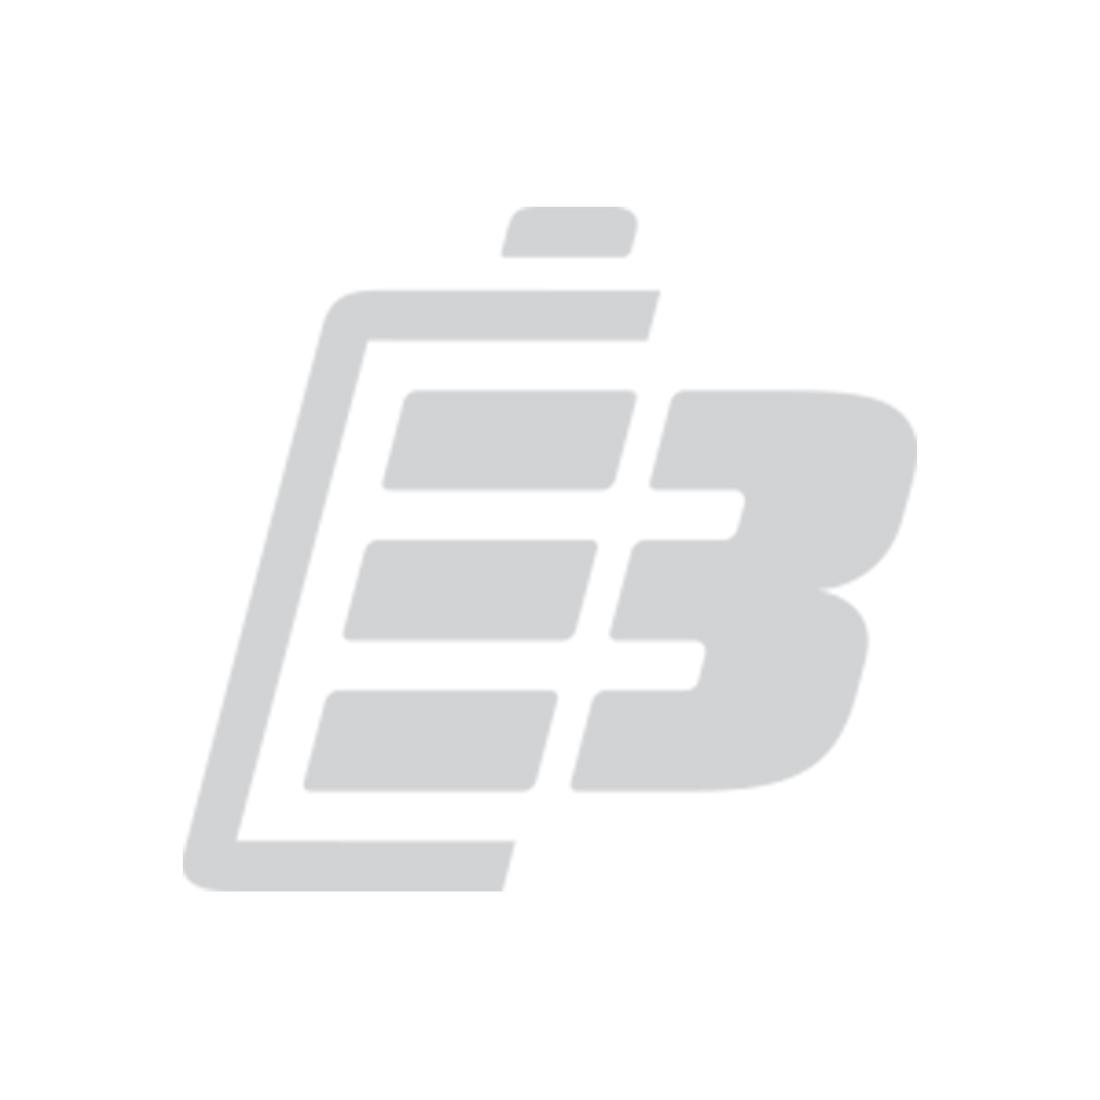 Cordless phone battery Avaya 3631_1